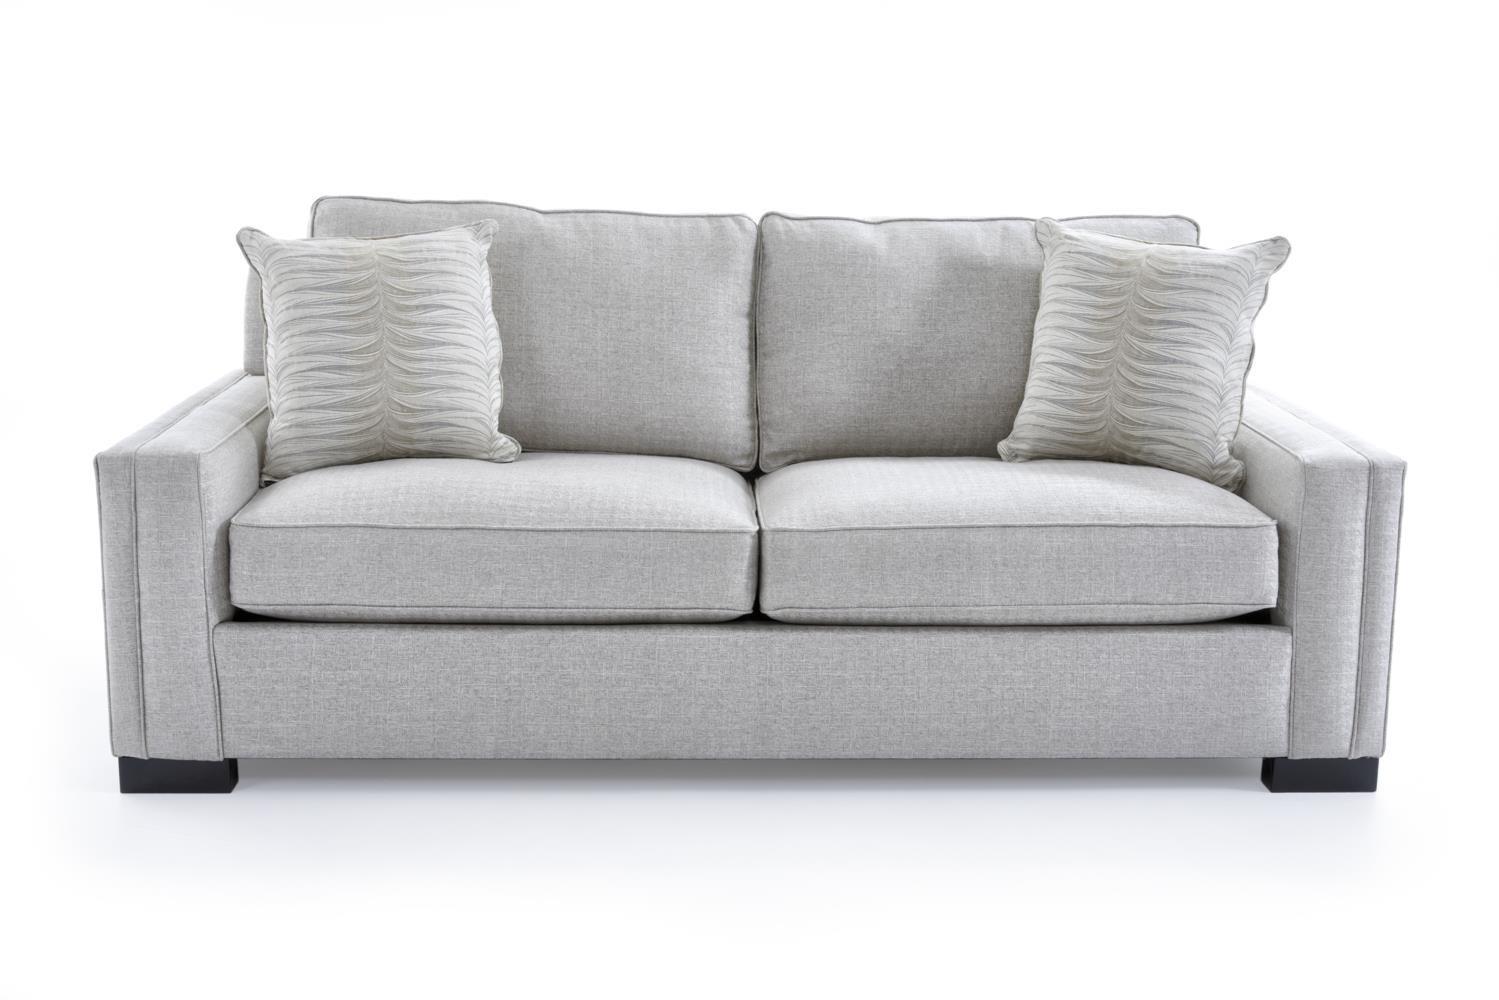 sofa beds naples florida expensive covers miami  thesofa